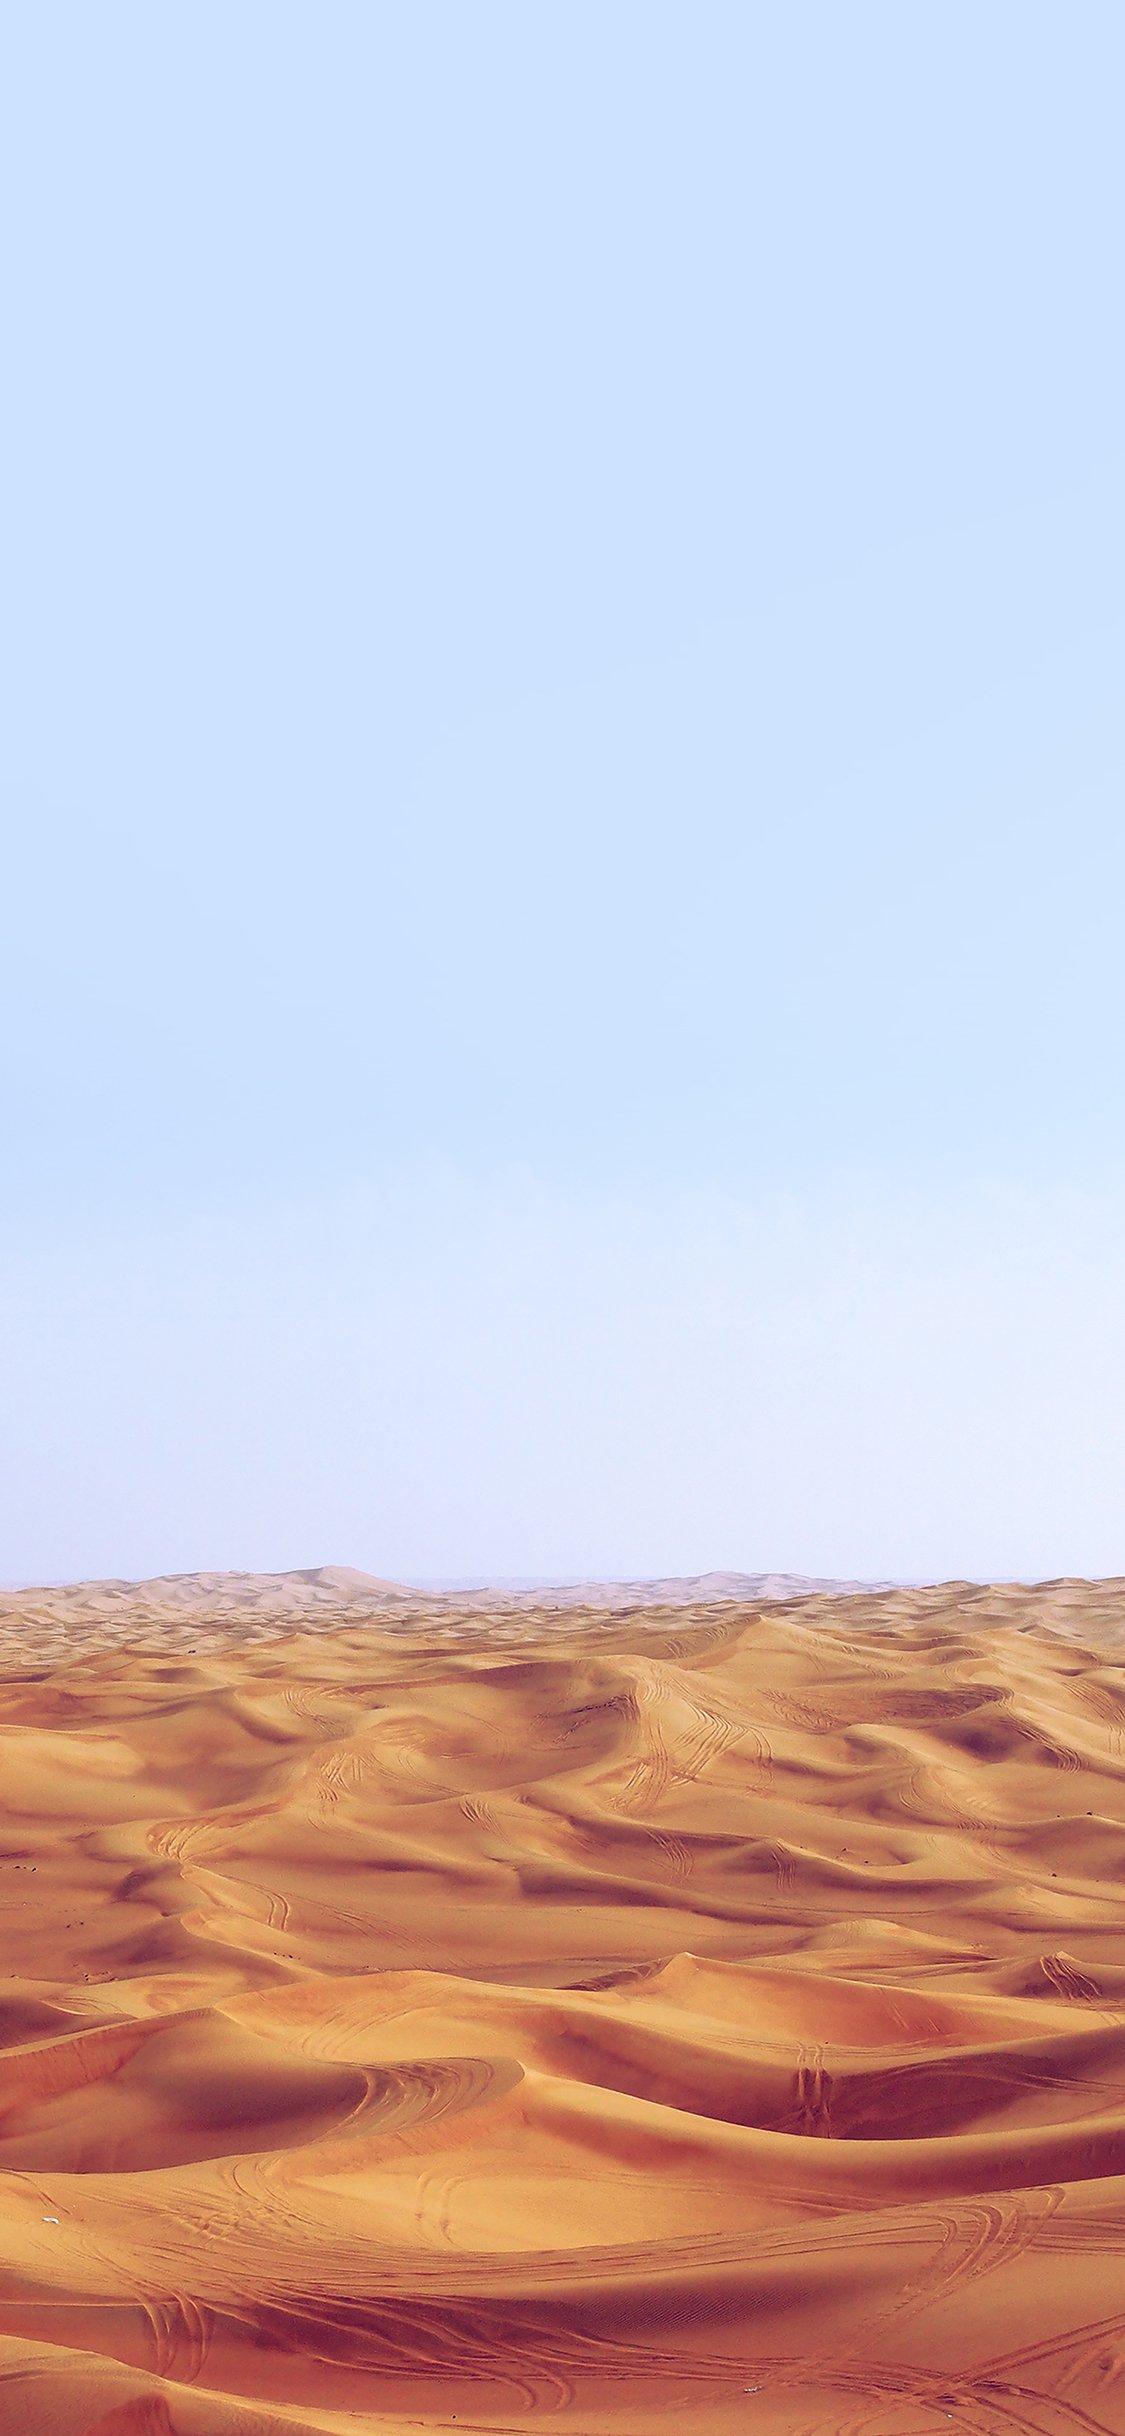 Desert minimal blue sky earth iPhone X wallpaper